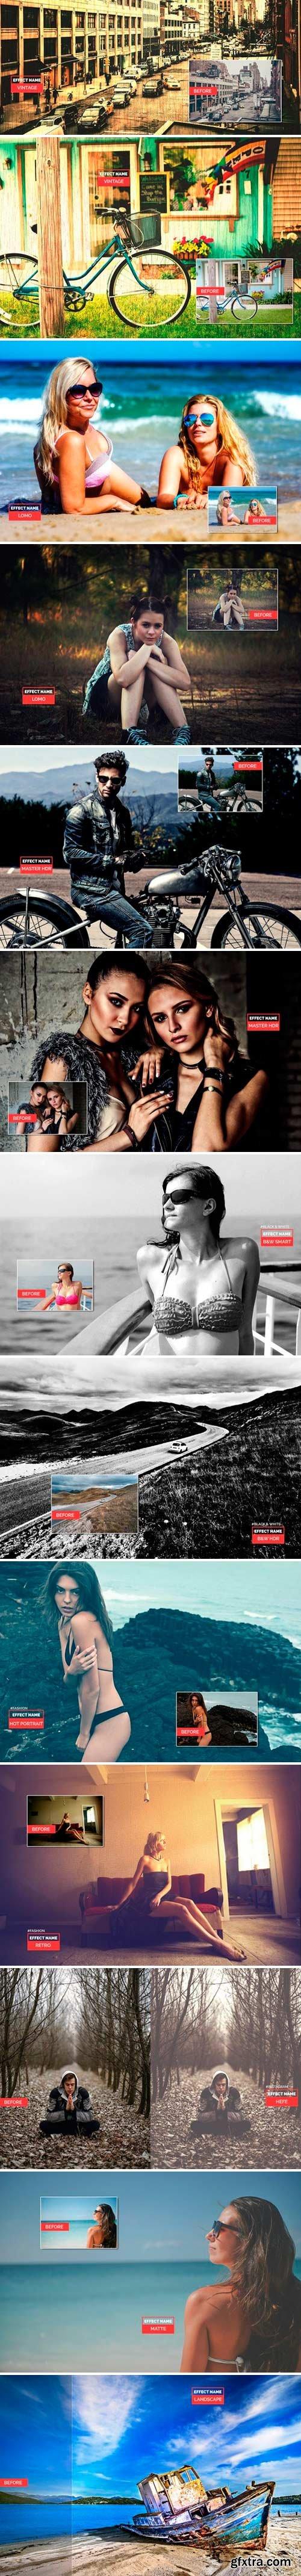 CM - Photographers Choice Action\'s Pack 2457457